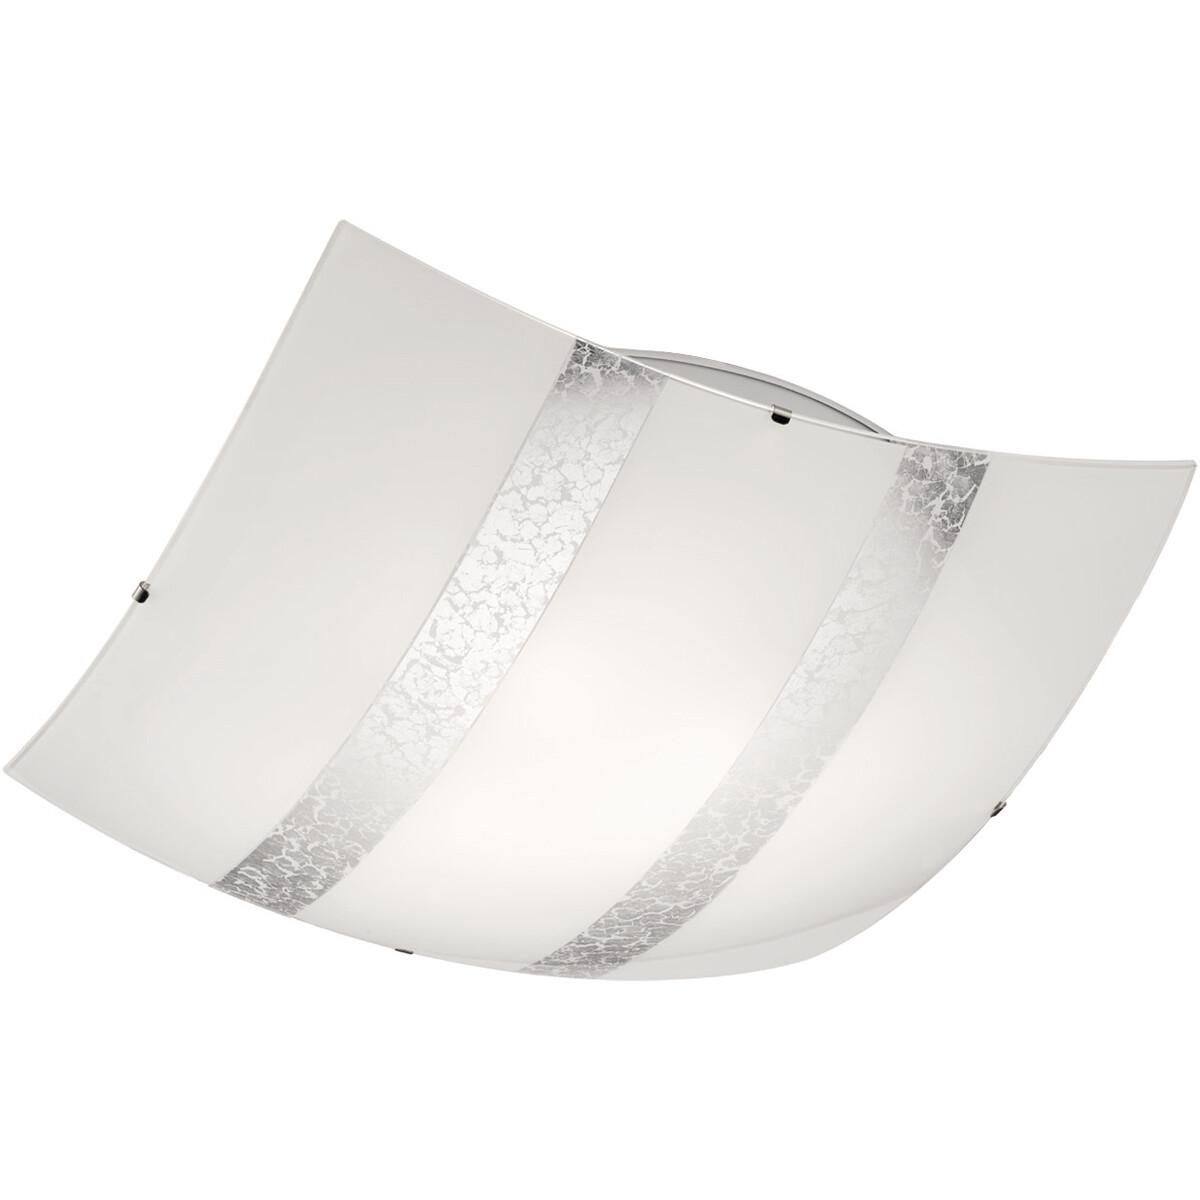 LED Plafondlamp - Plafondverlichting - Trion Niki - E27 Fitting - 3-lichts - Vierkant - Mat Zilver -